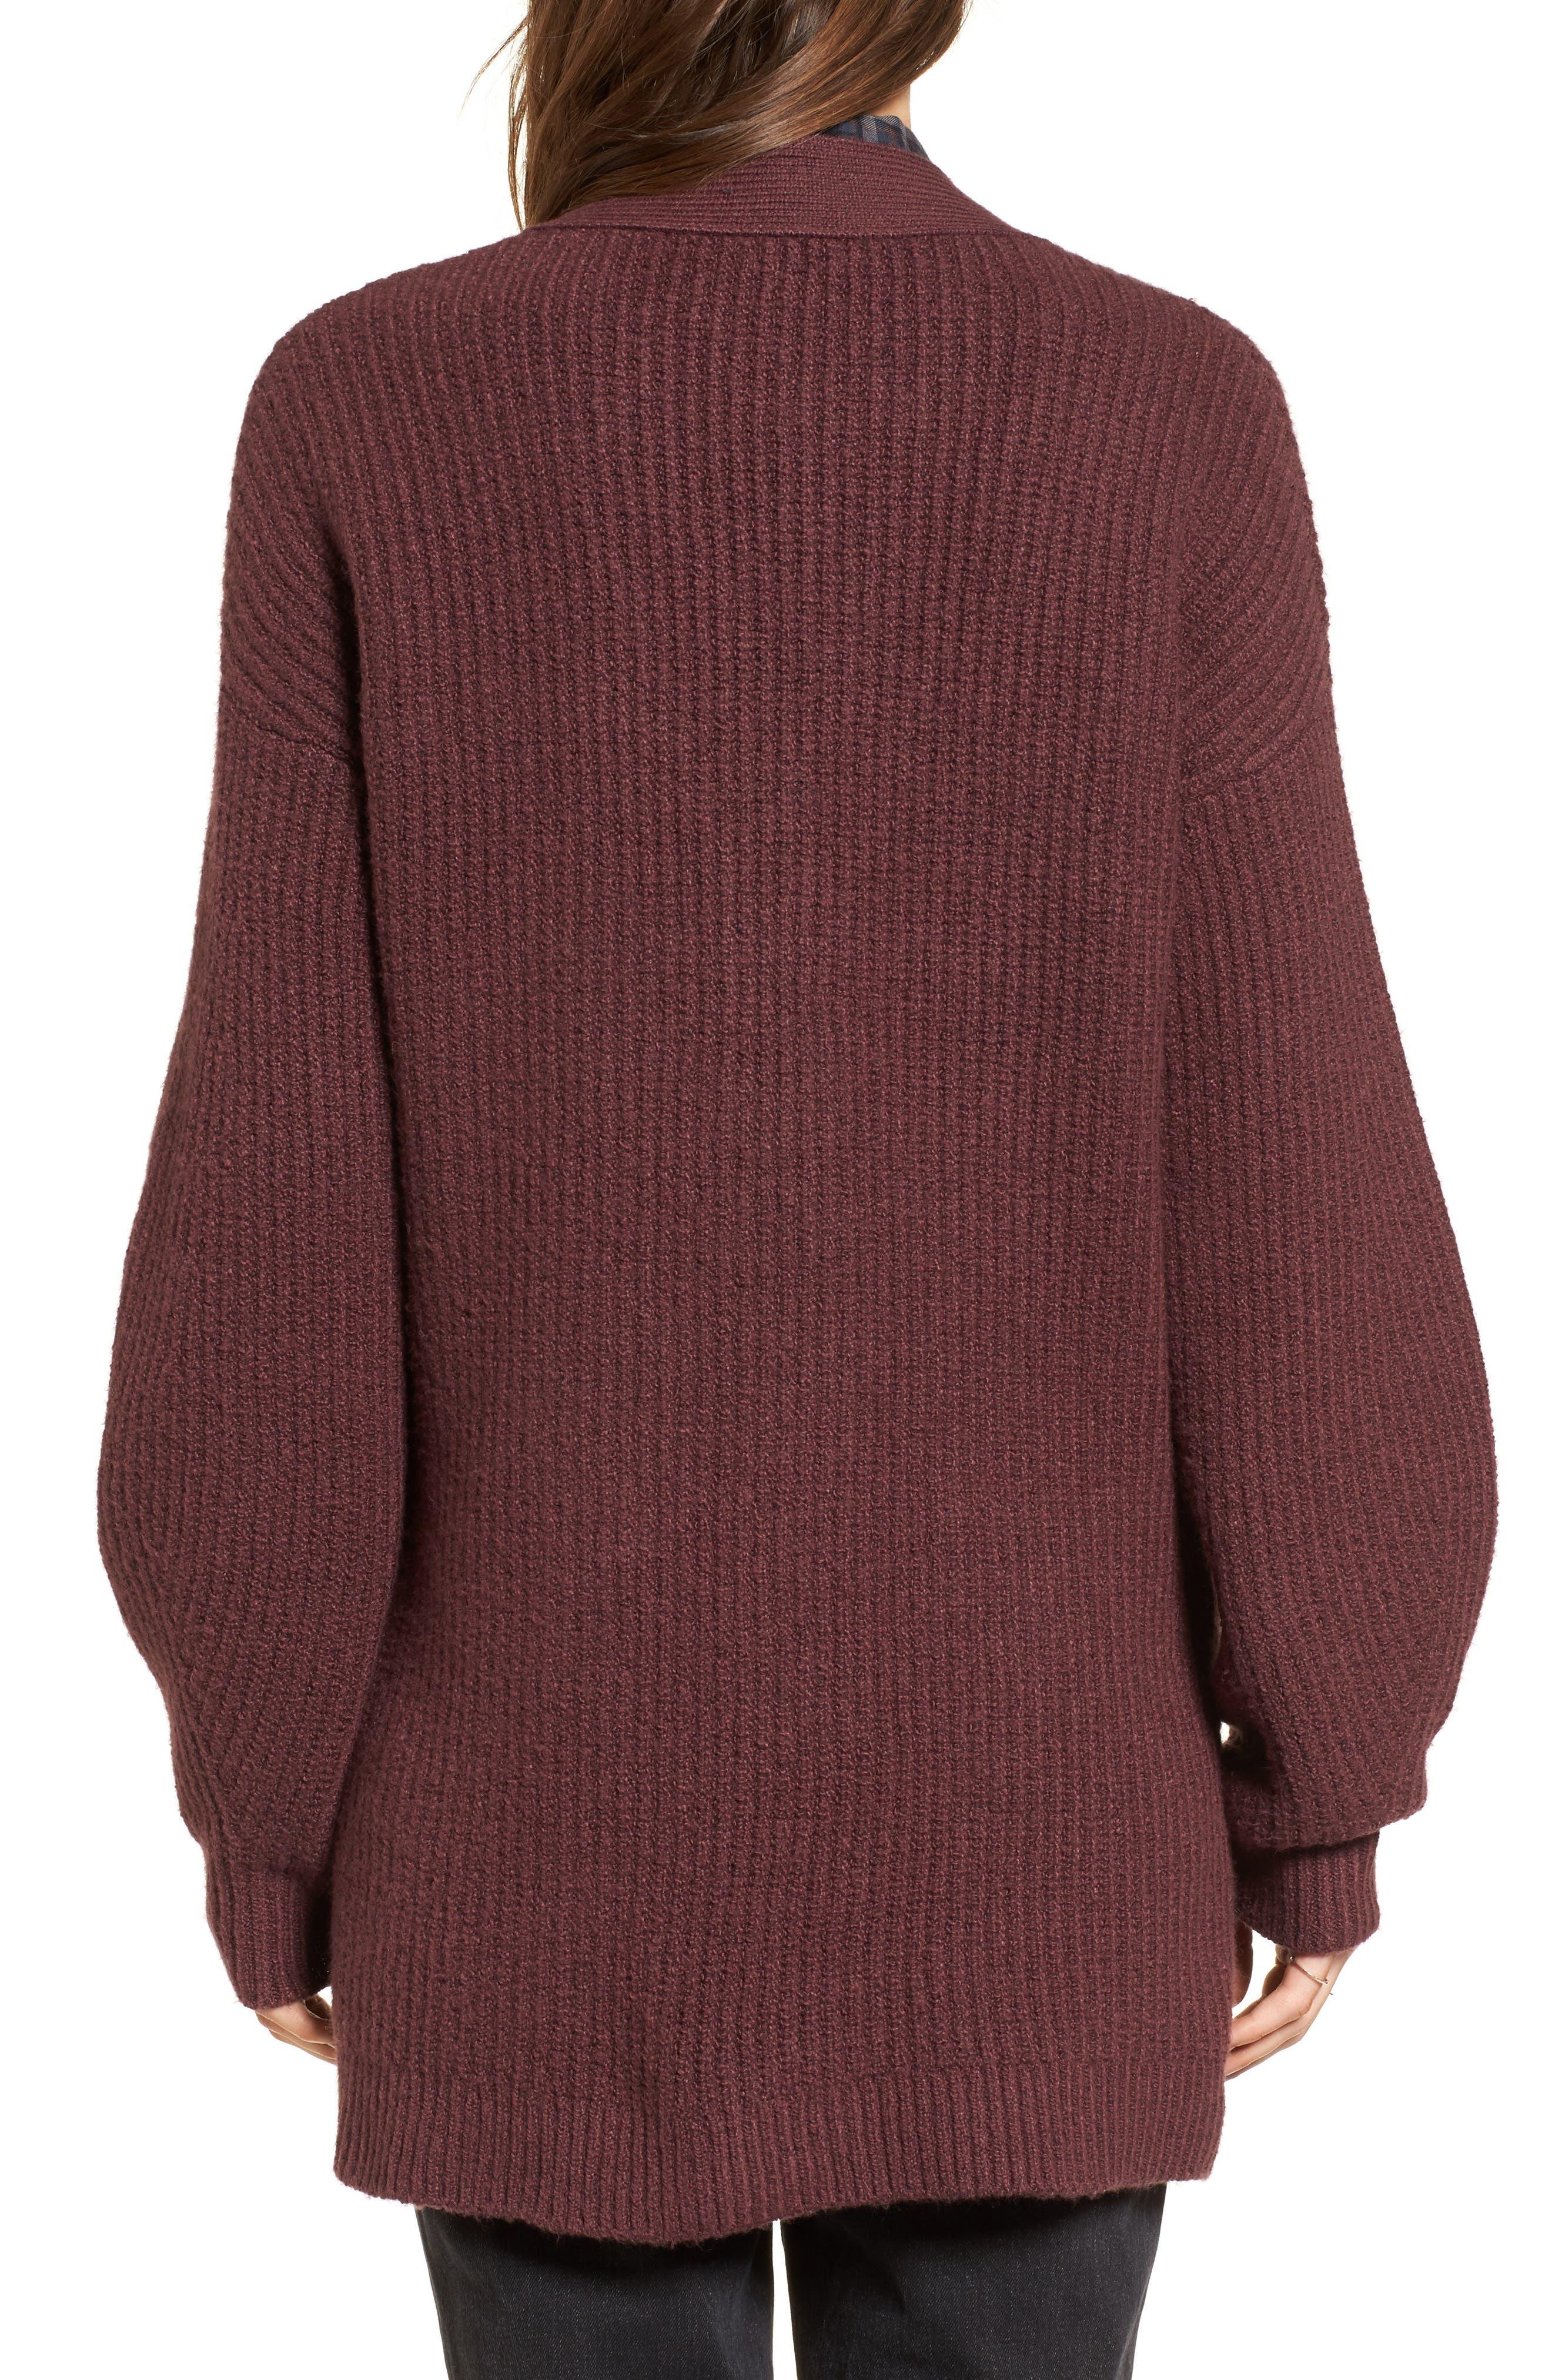 Ribbed Cardigan Sweater,                             Alternate thumbnail 2, color,                             Burgundy Fudge